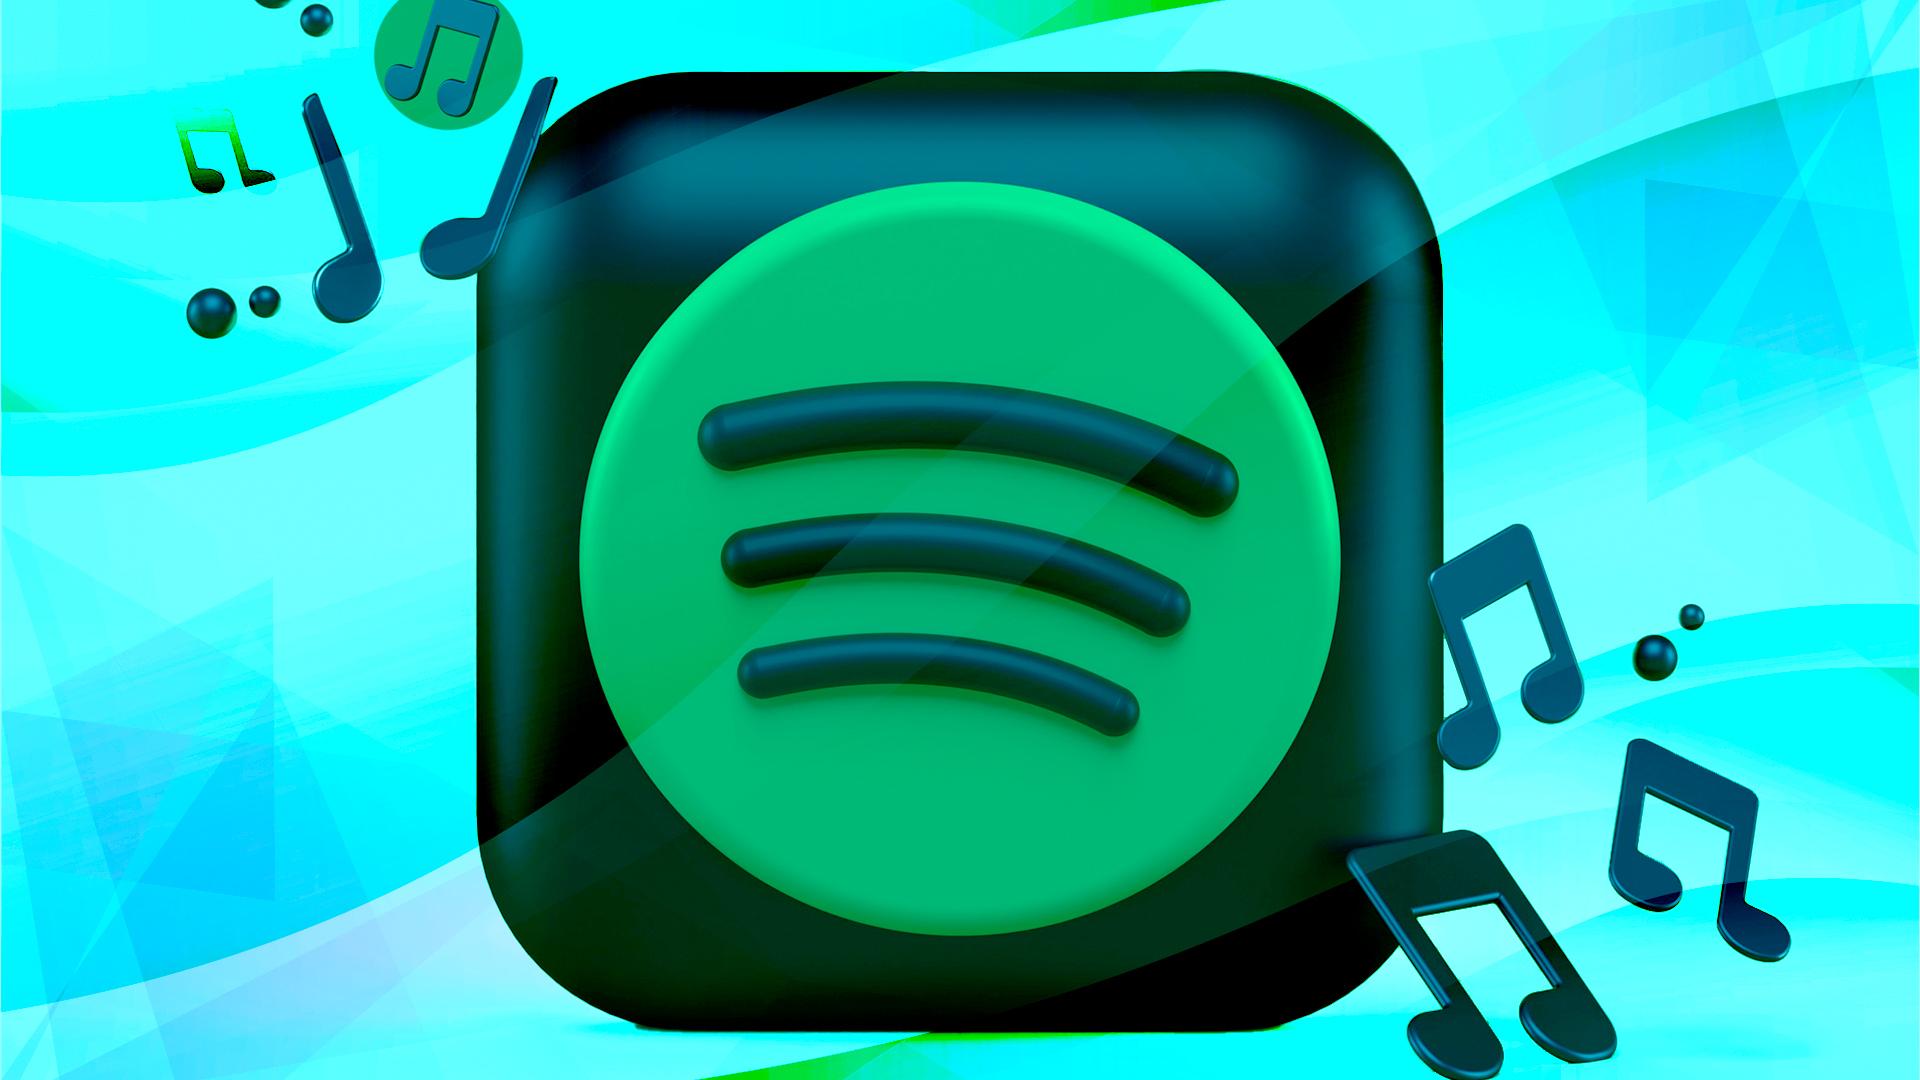 Streaming, Musik, Streamingportal, Audio, Musik-Streaming, Spotify, musikstreaming, Player, Musikdienst, abspielen, Play, Musik-Plattform, Audio Player, Musikflat, playlist, Song, Spotify Premium, Musik Streaming, Music Streaming, Spotify Logo